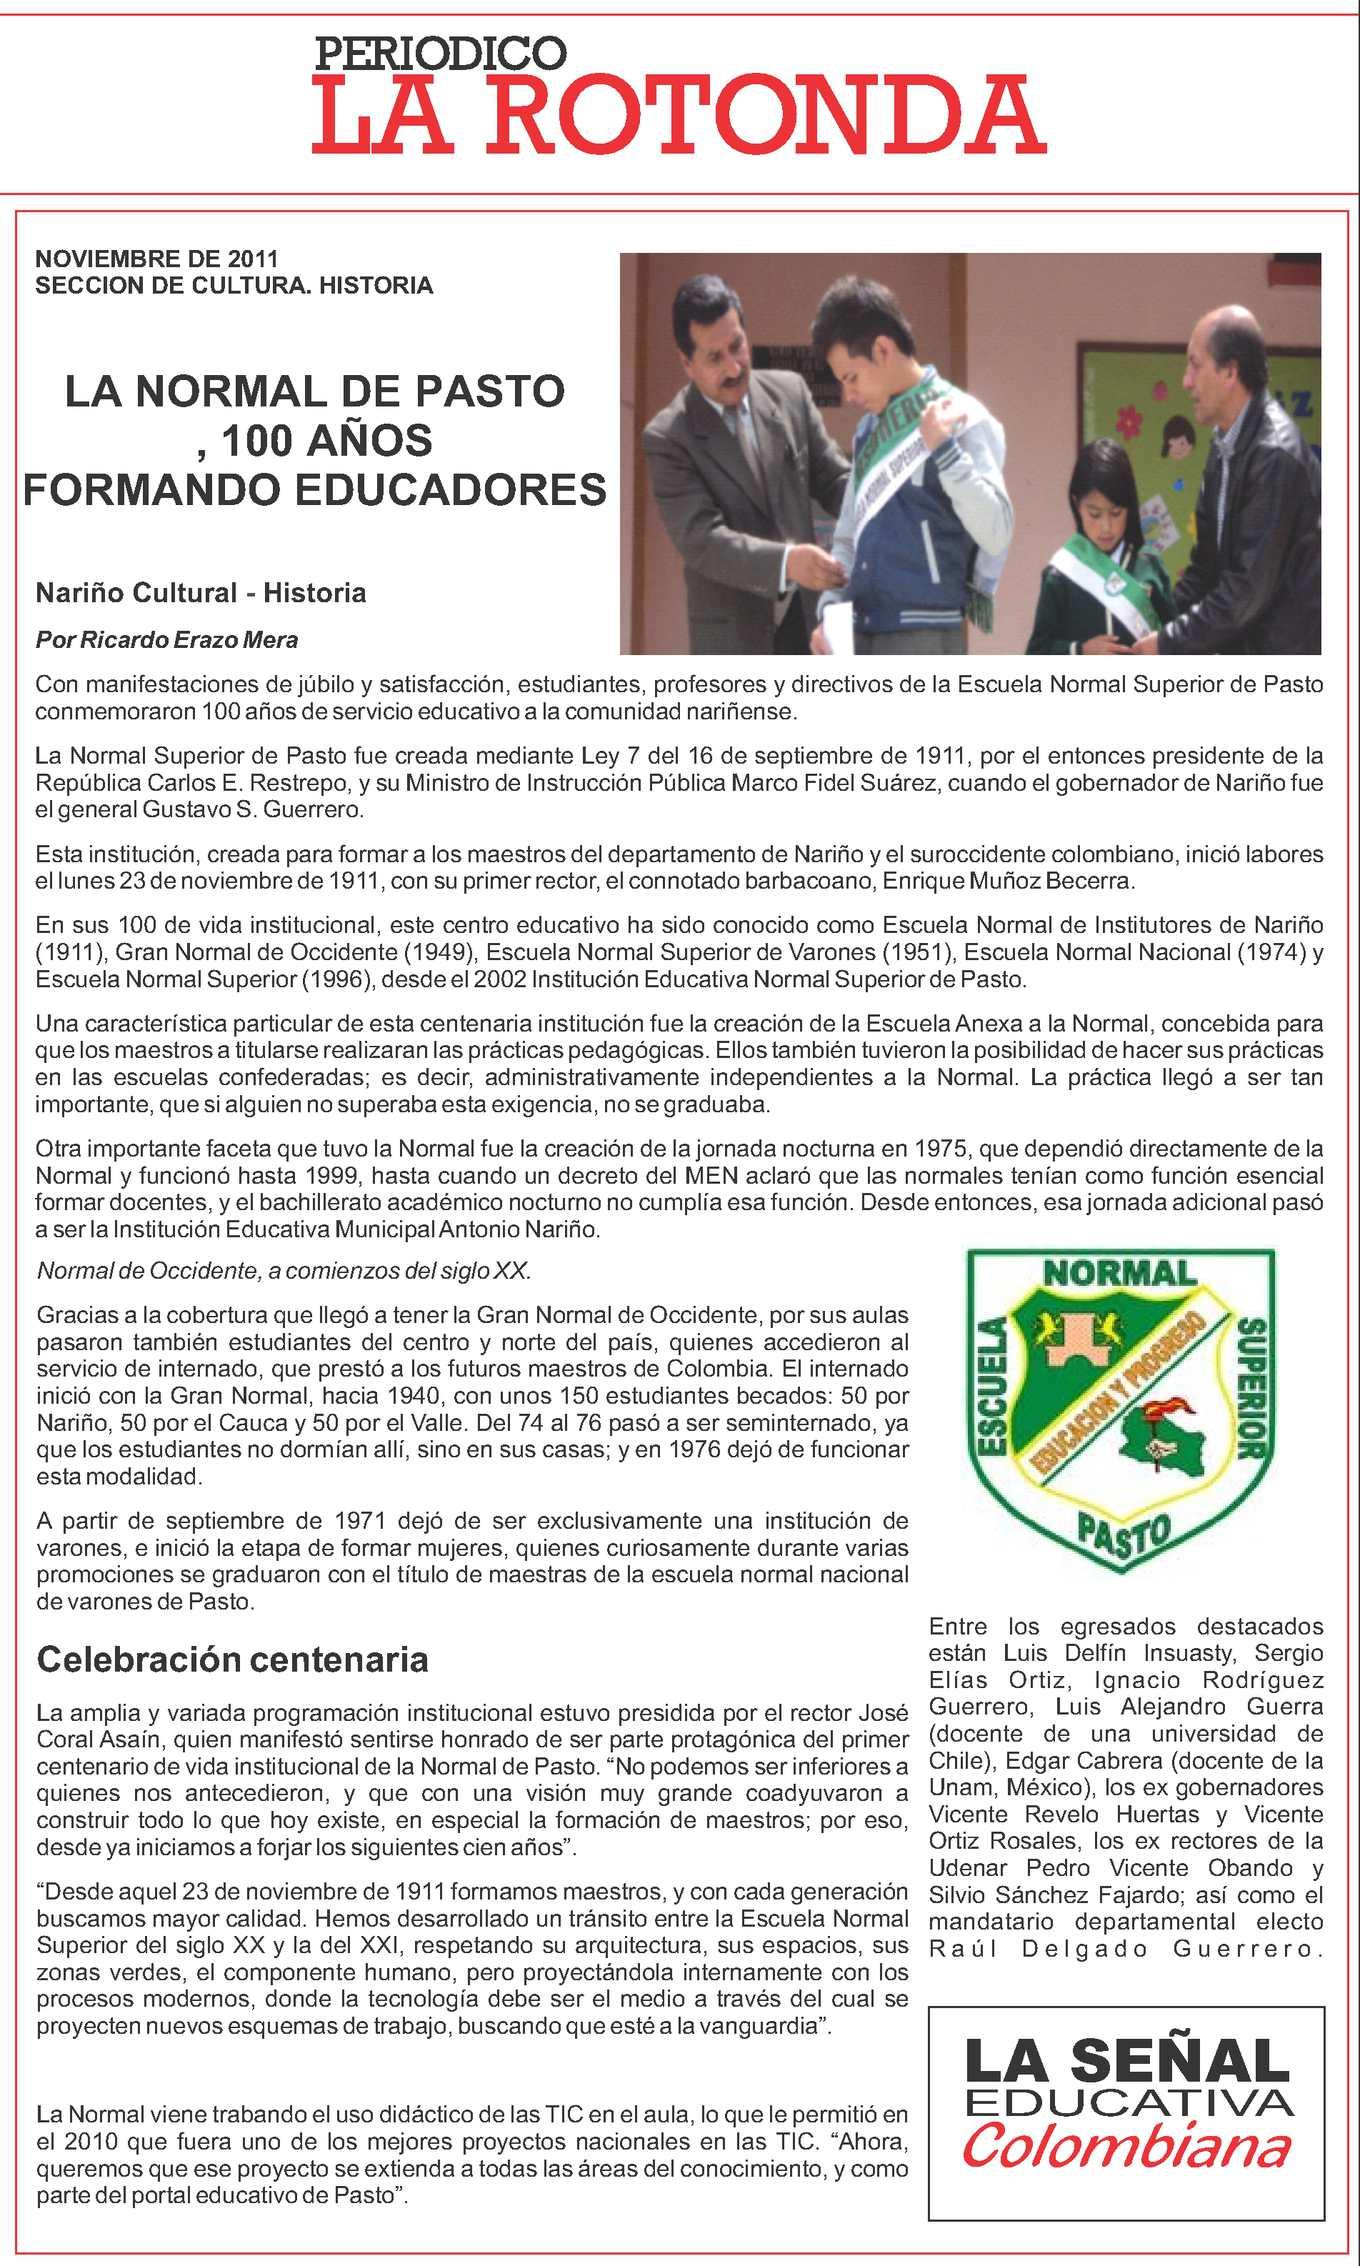 Calaméo - Periodico